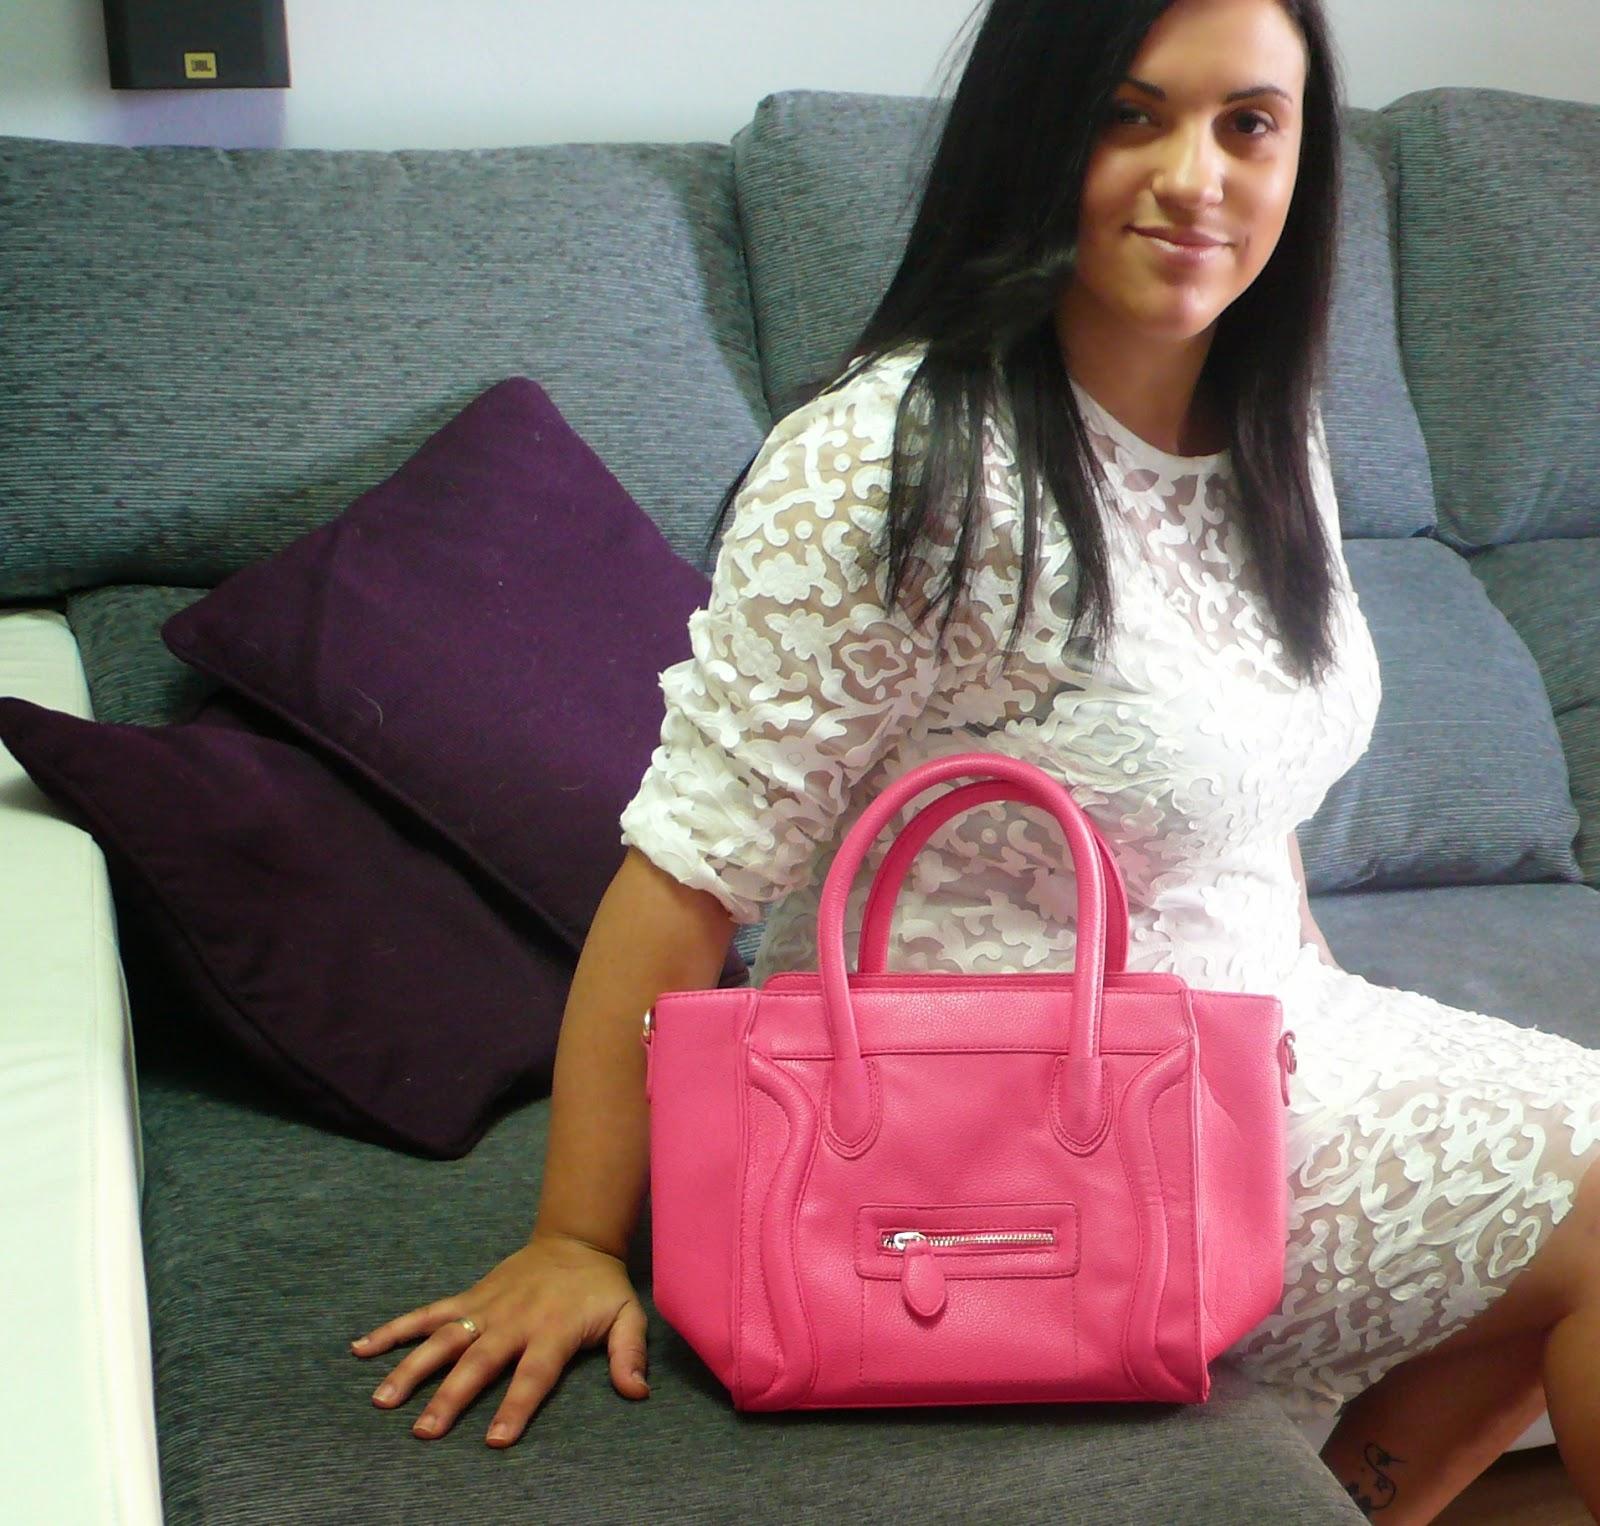 http://www.oasap.com/shoulder-bags/37224-sweet-smile-face-bag.html?fuid=98518